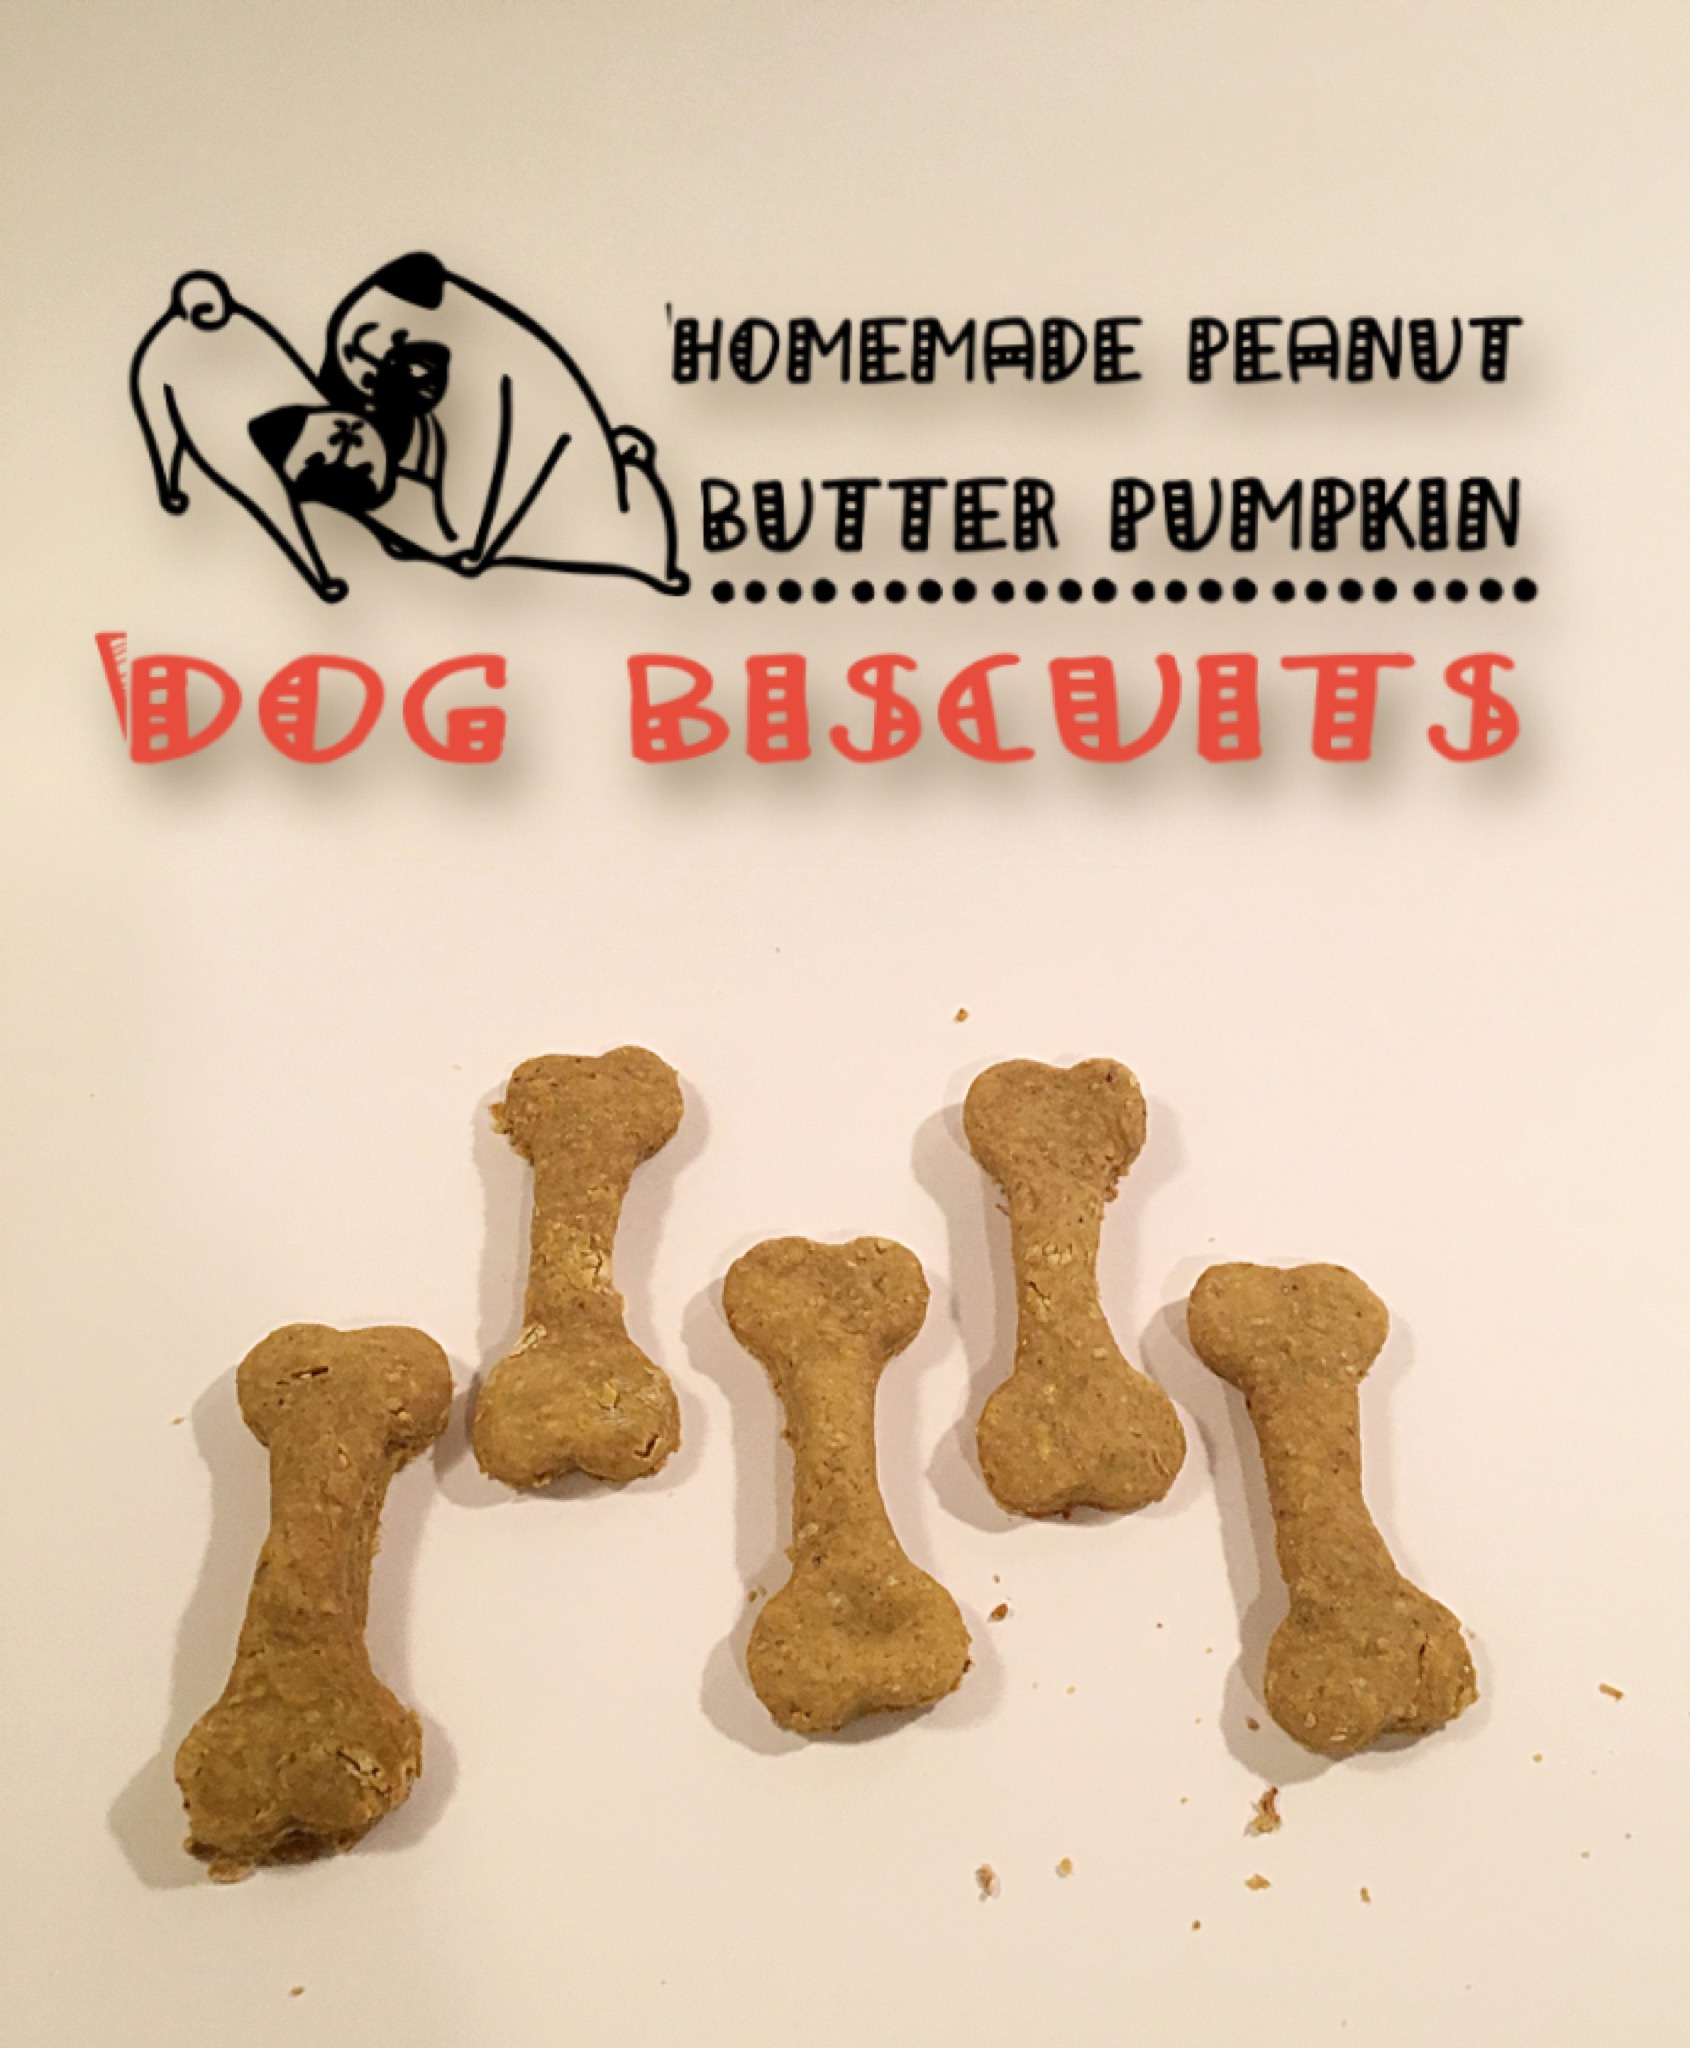 dog biscuits, pumpkin dog biscuits, peanut butter dog biscuits, peanut butter pumpkin dog biscuits, healthy dog biscuits, healthy dog treats, peanut butter pumpkin dog treats, diy dog treats, diy dog biscuits